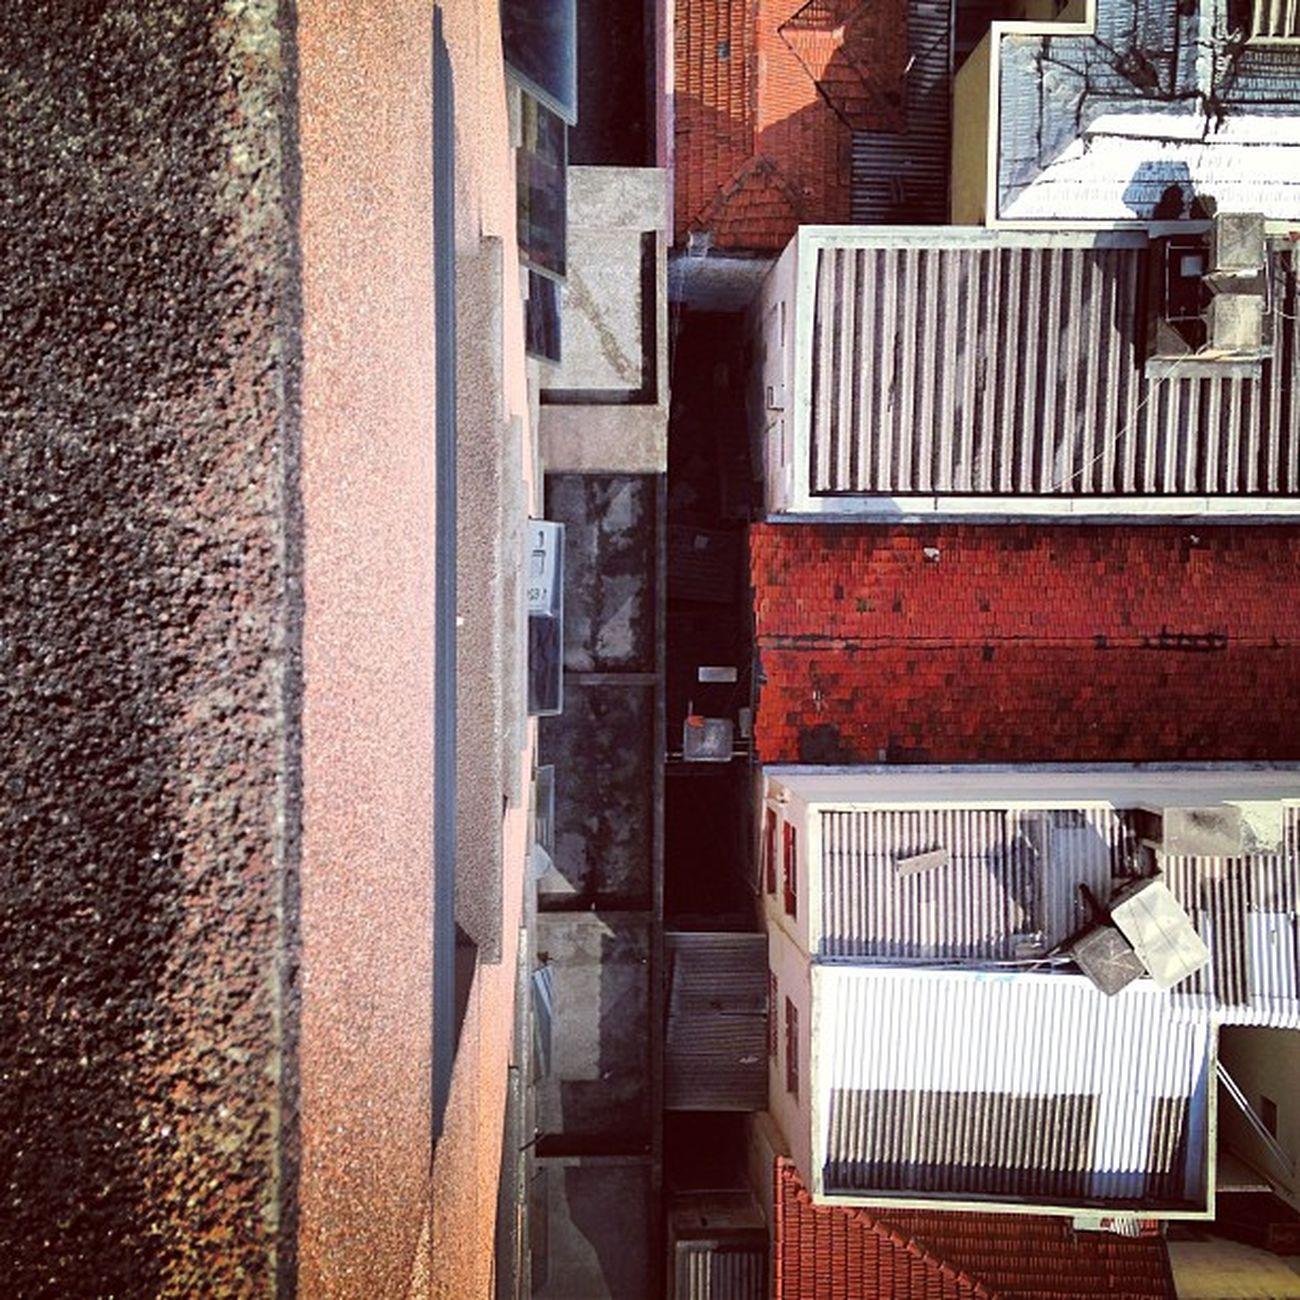 Roof Urban Urbanlife Urbanphoto Street Streetsphotography Instagram Insta_global Insta_global_urban Insta_streets Saopaulo